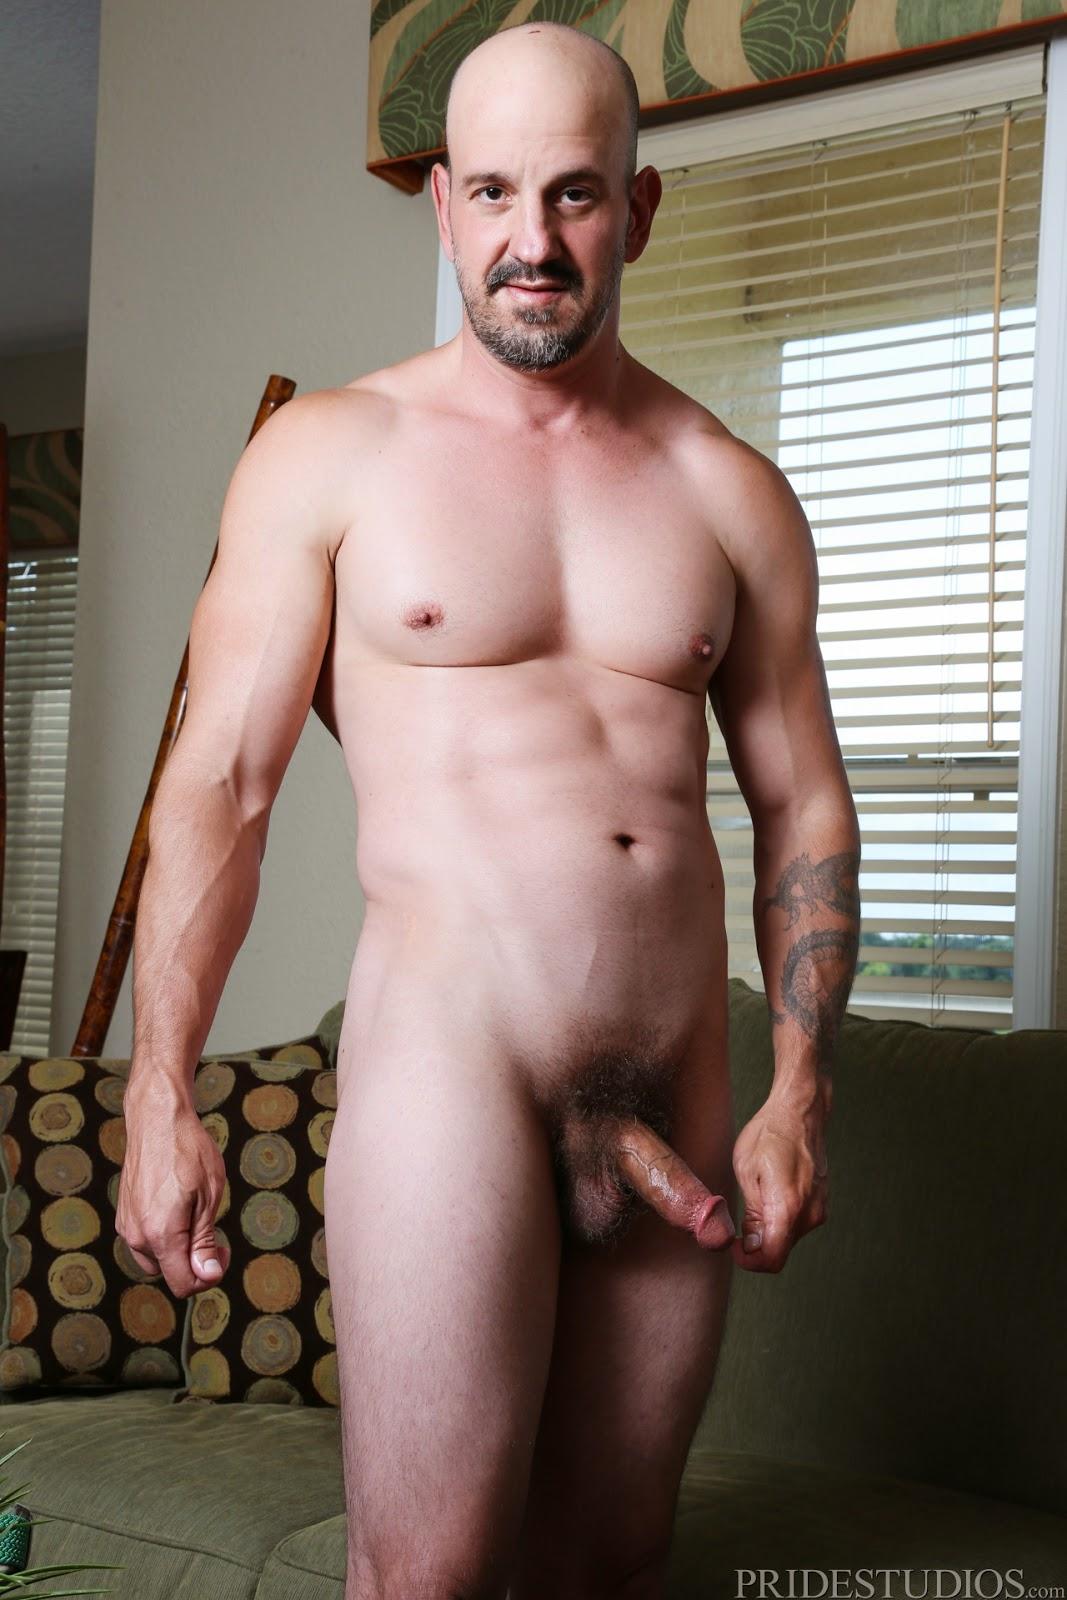 gay nudist roommate